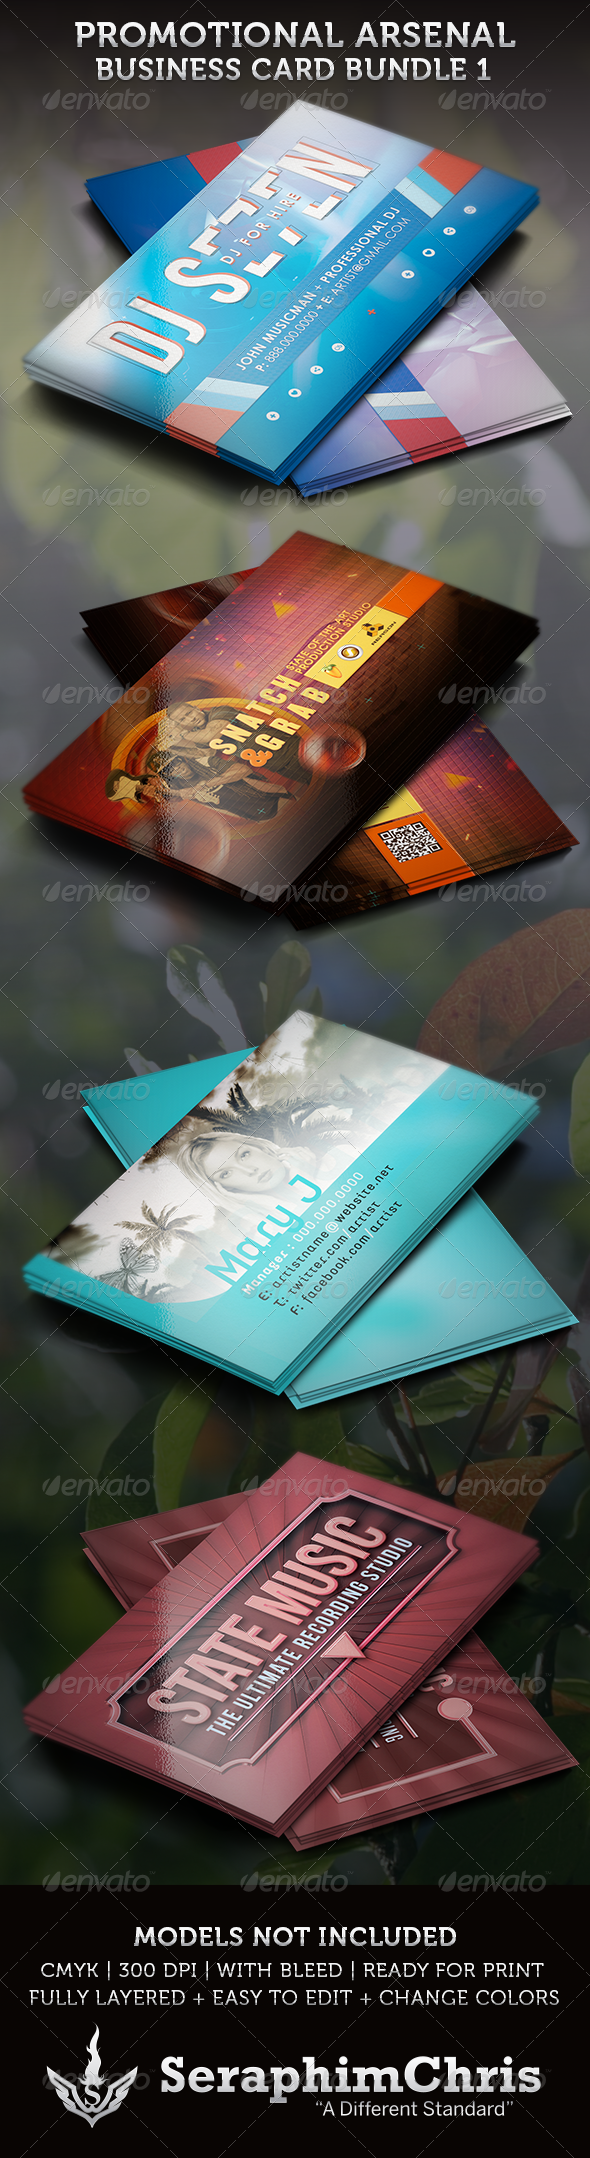 GraphicRiver Promotional Arsenal Business Card Bundle 1 3630509